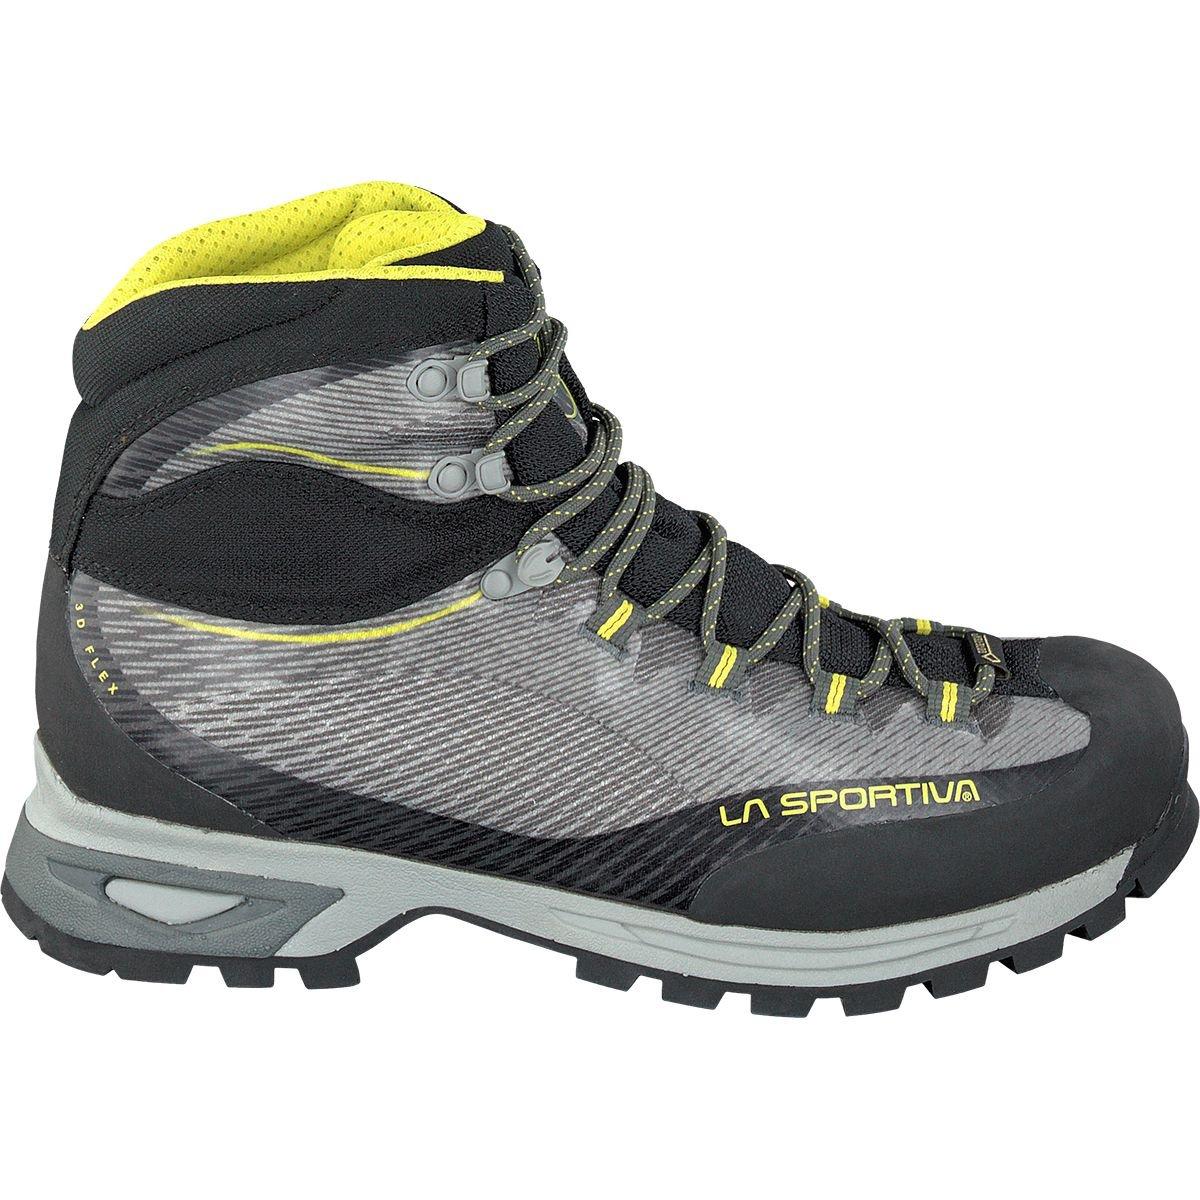 La Sportiva Unisex-Erwachsene Trango TRK GTX Carbon/Sulphur Trekking-& Wanderstiefel